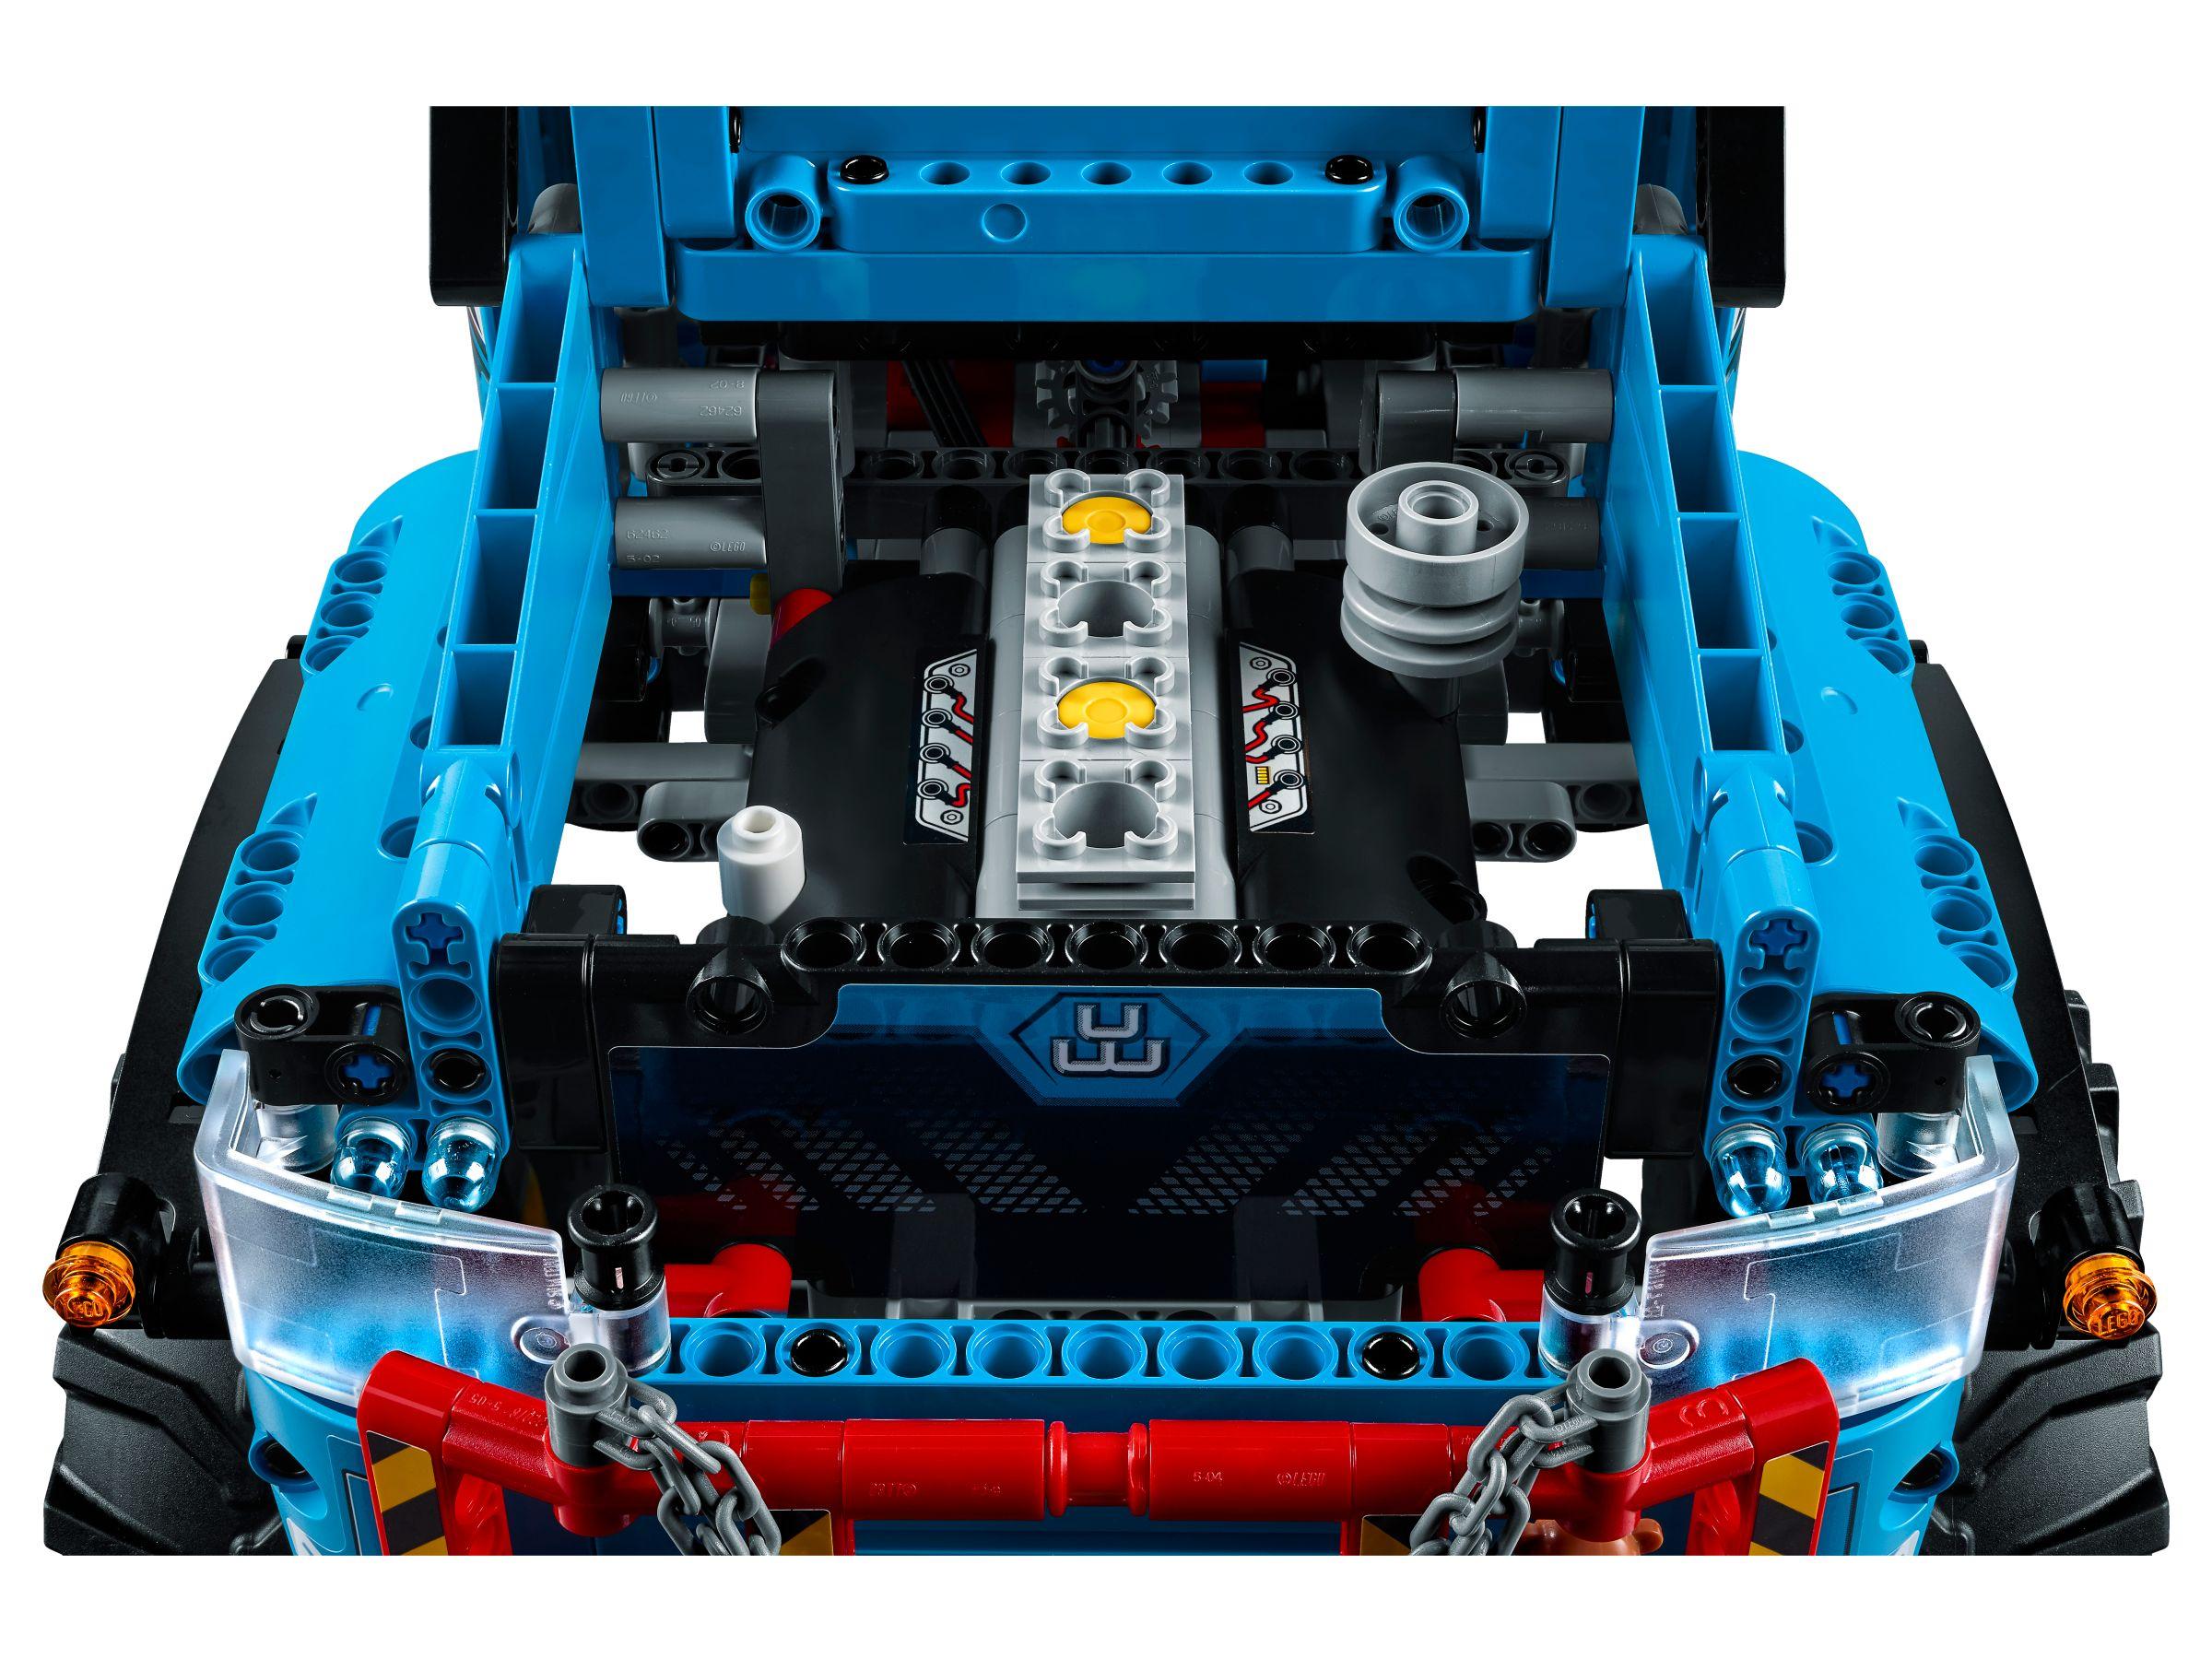 Lego Technic 42070 Allrad Abschleppwagen Ab 17099 32 Gespart